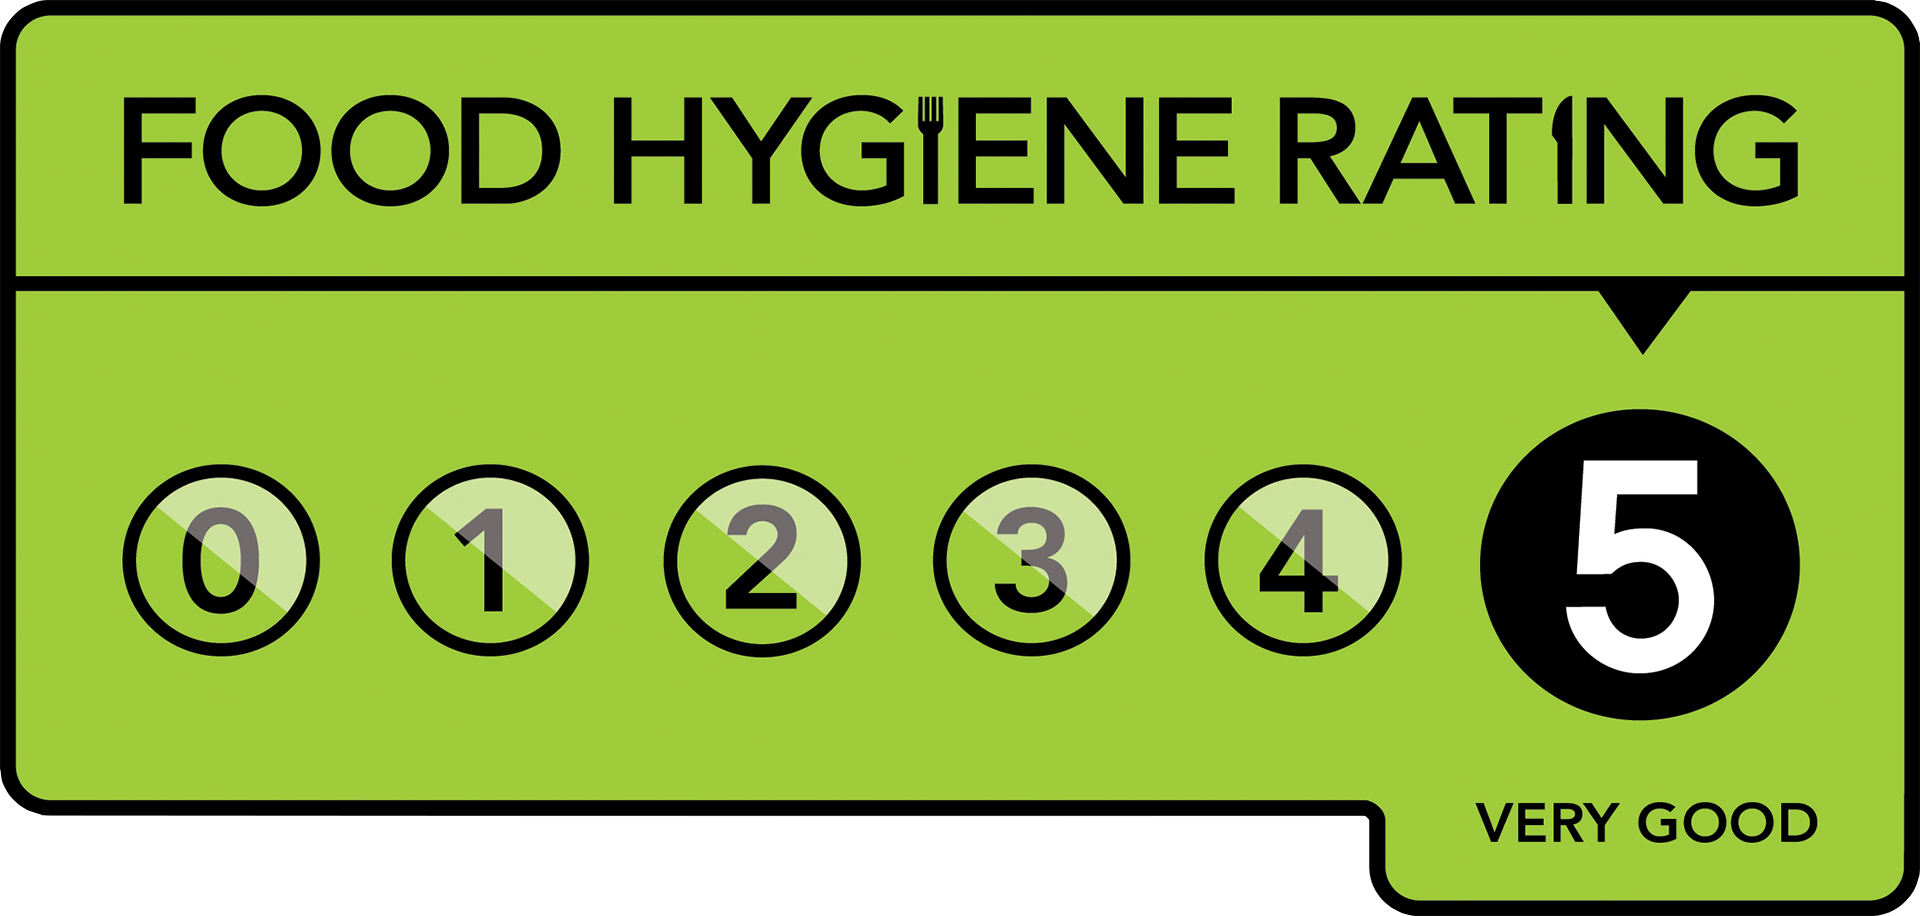 Food hygiene rating logo